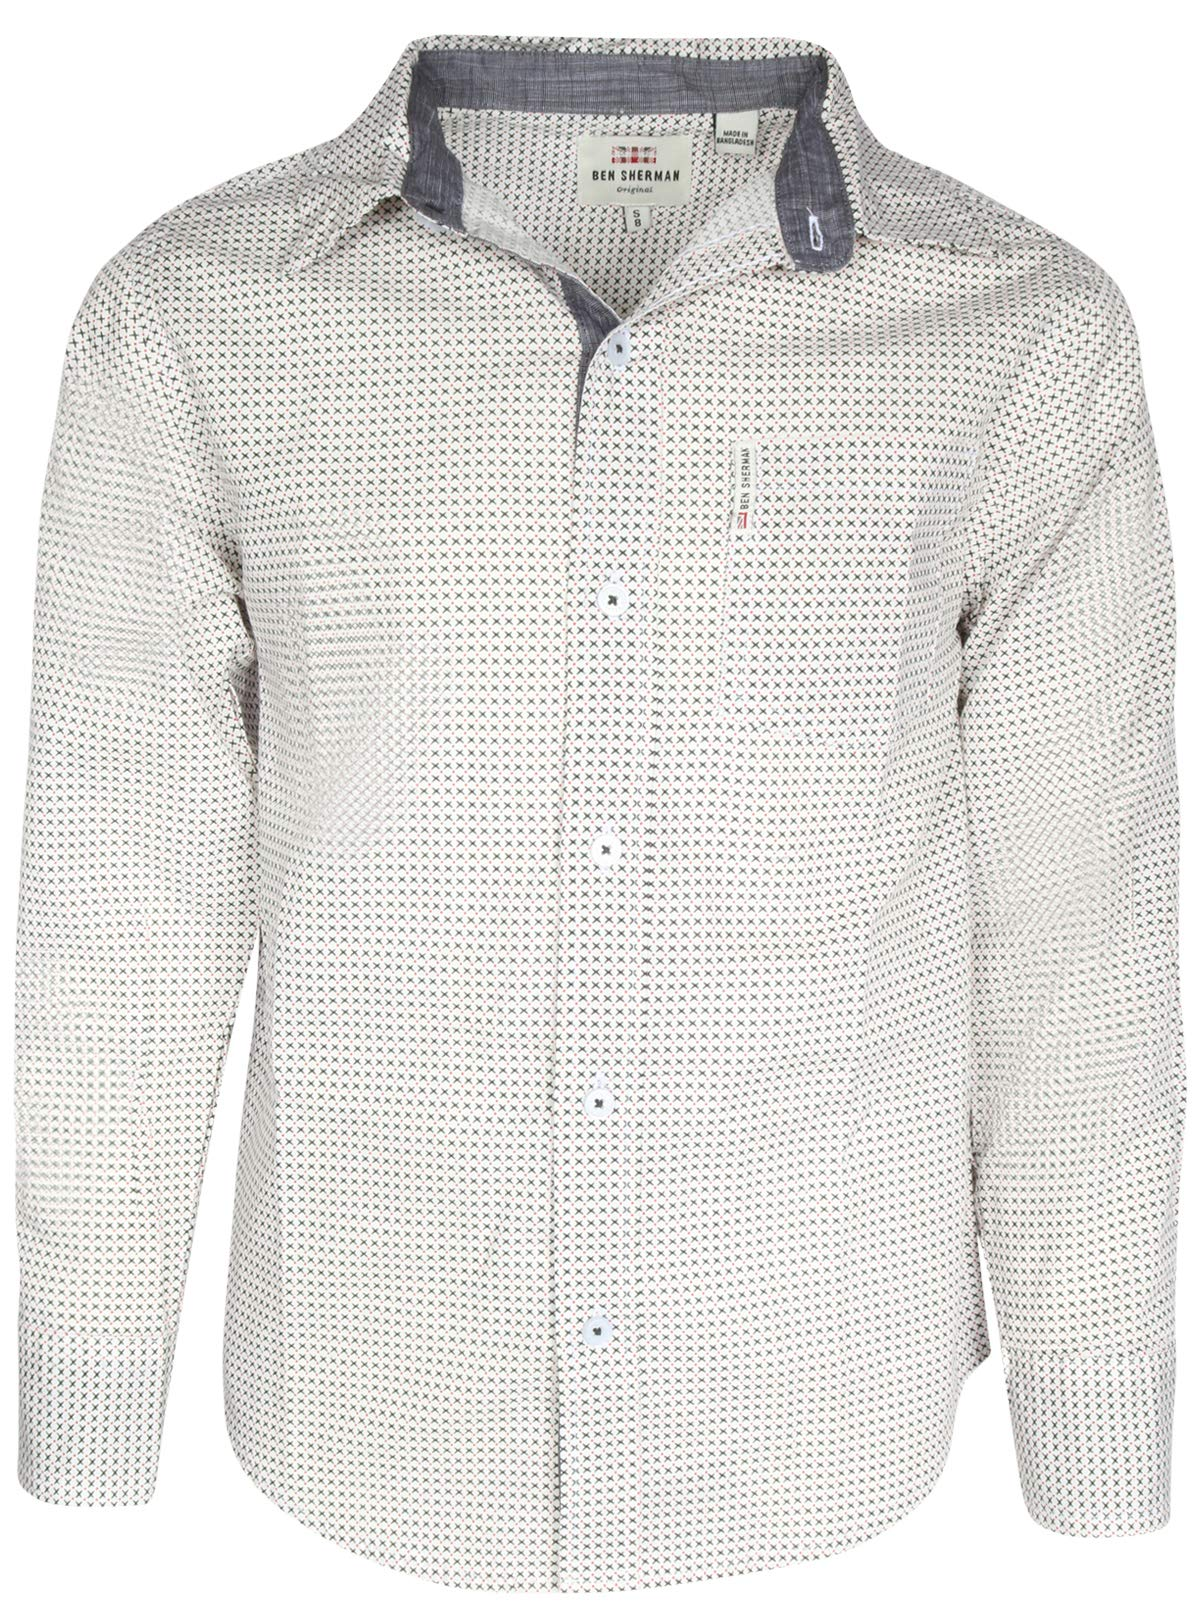 Ben Sherman Boys Long Sleeve Button Down Shirt